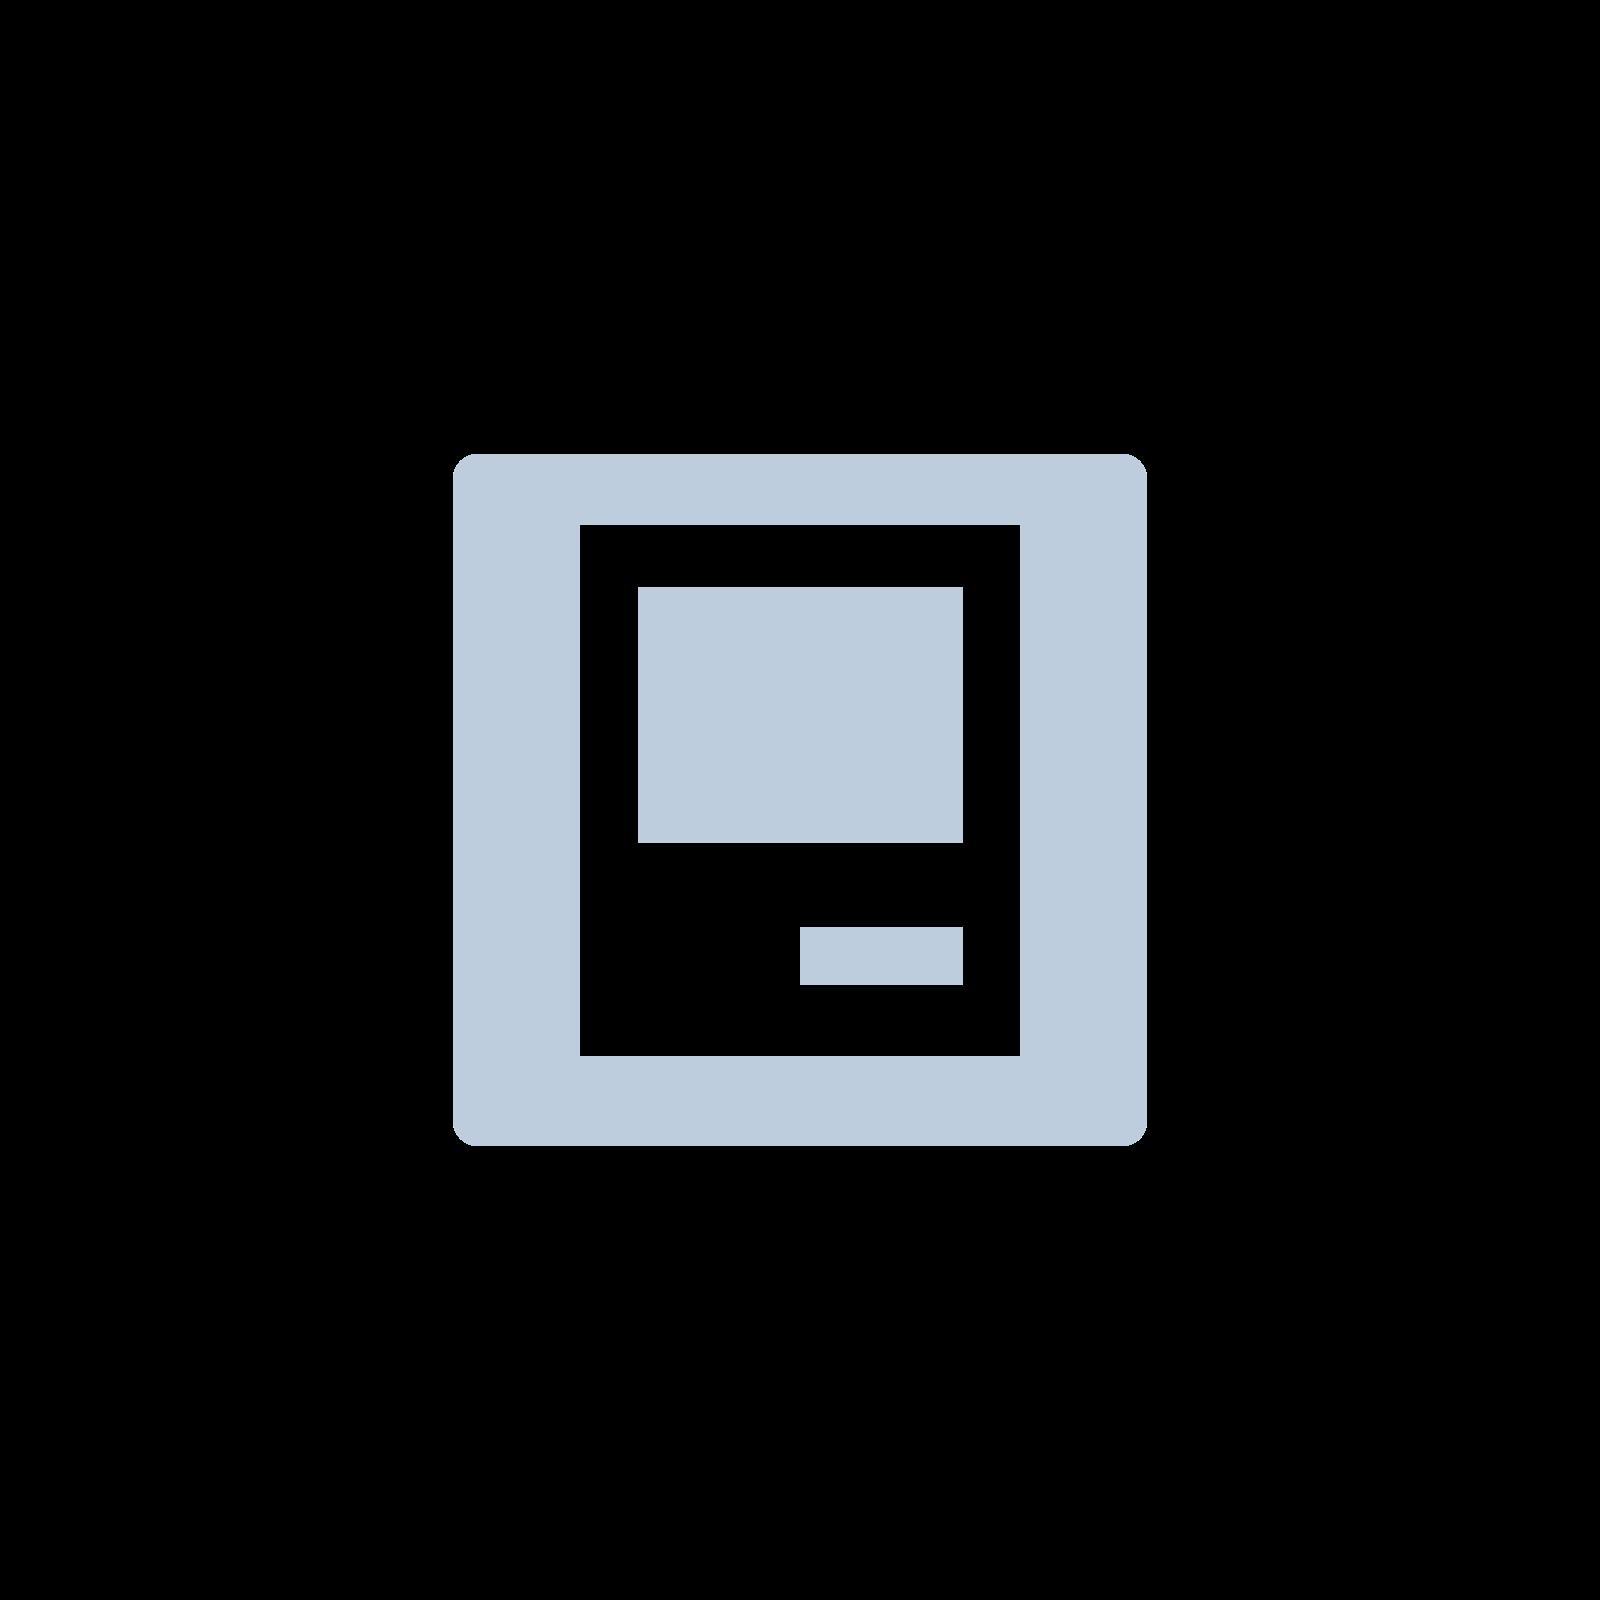 Apple Time Capsule (3. Generation) 2TB MC344LL/A A1355